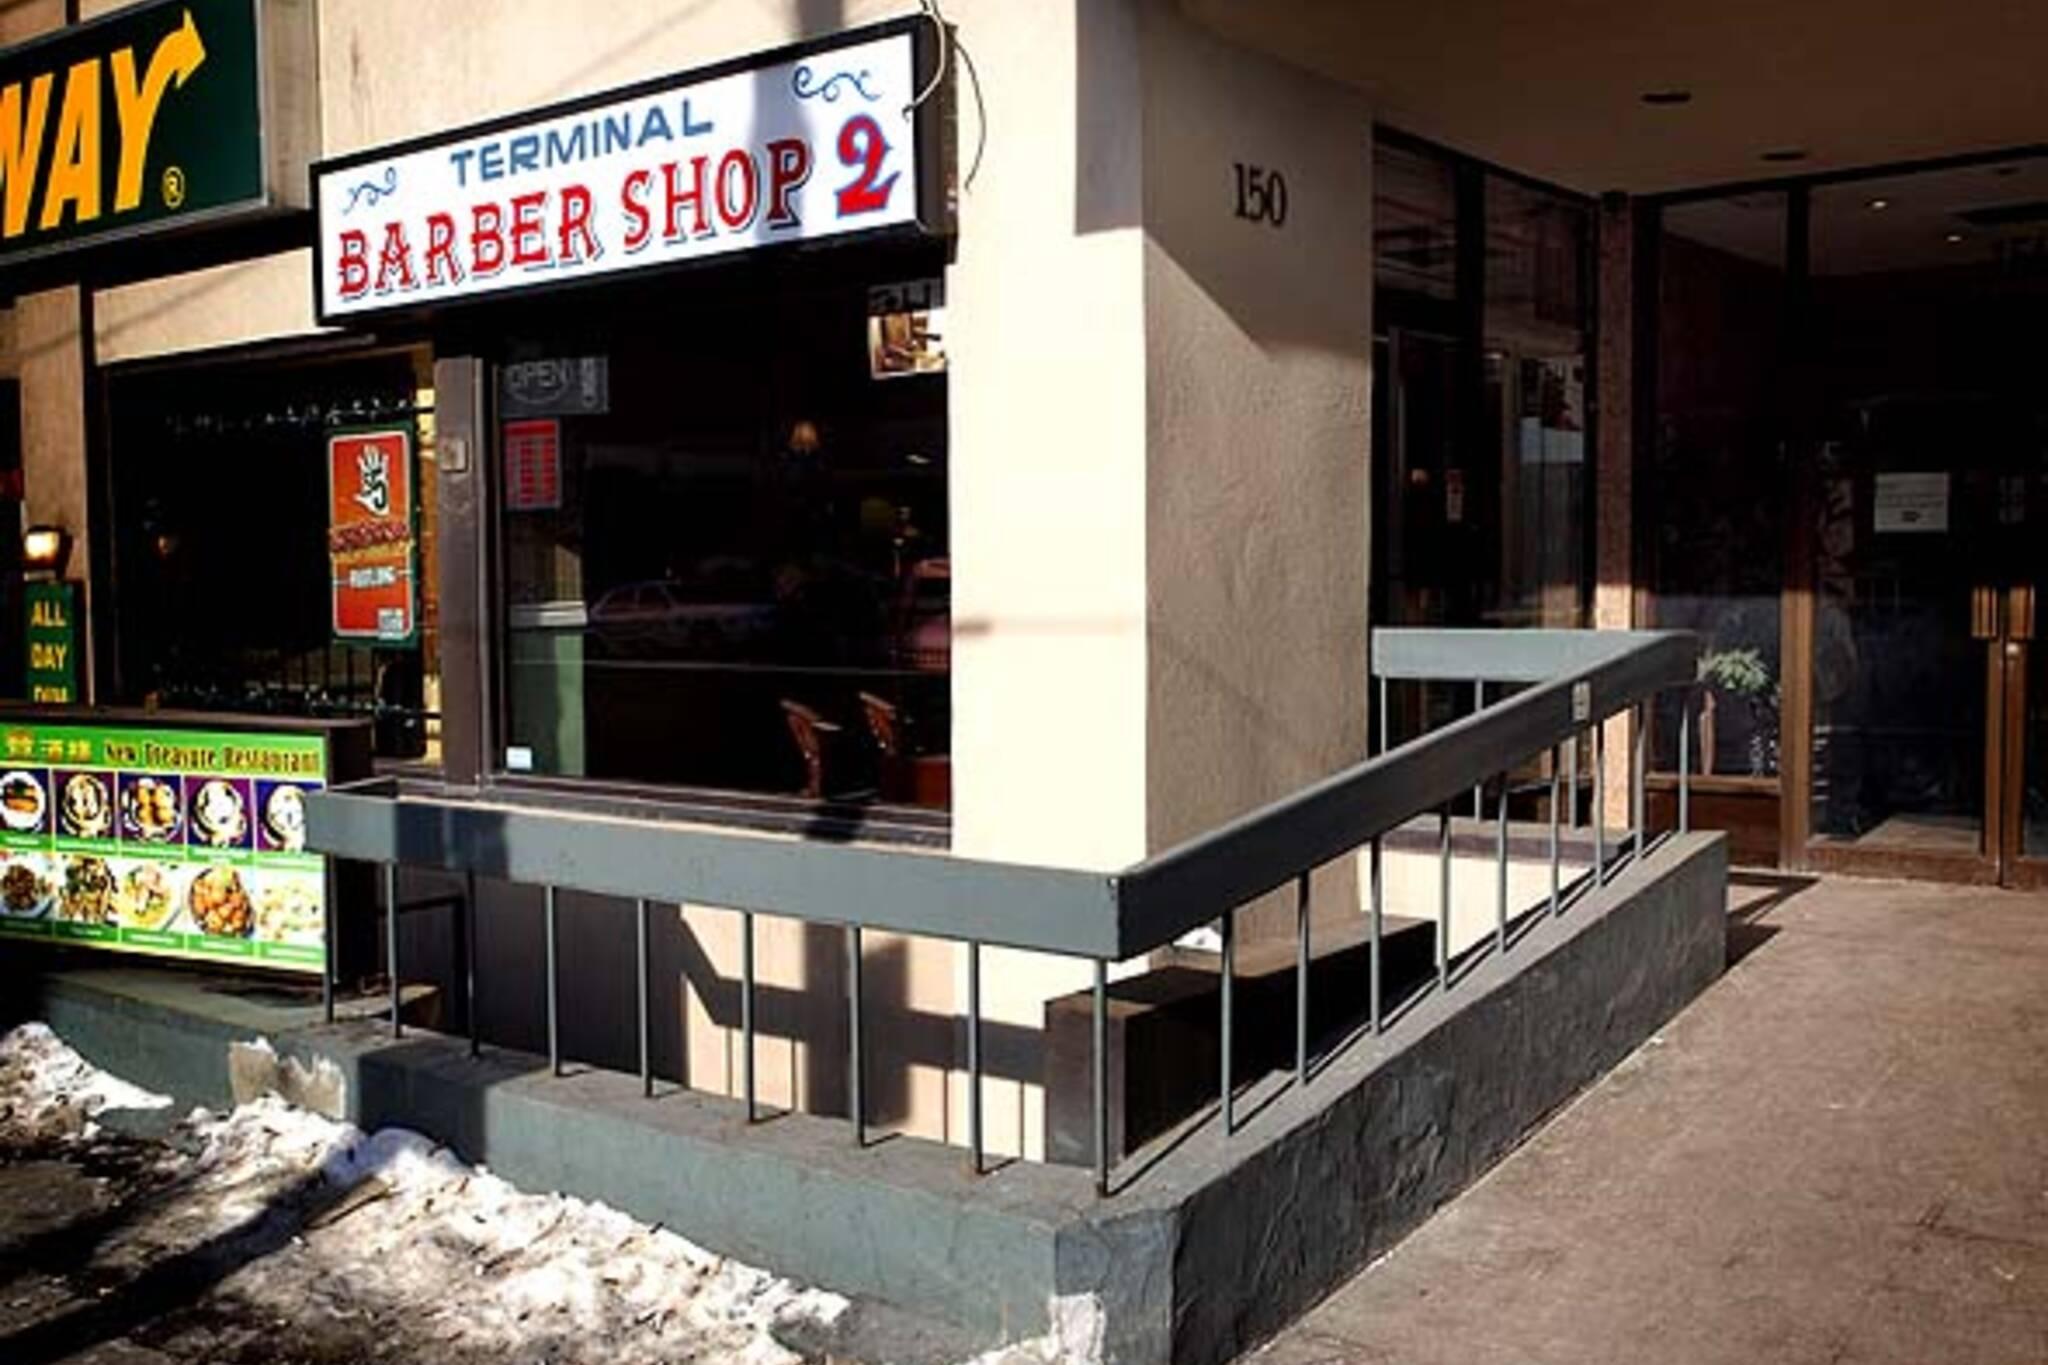 Toronto barbershop